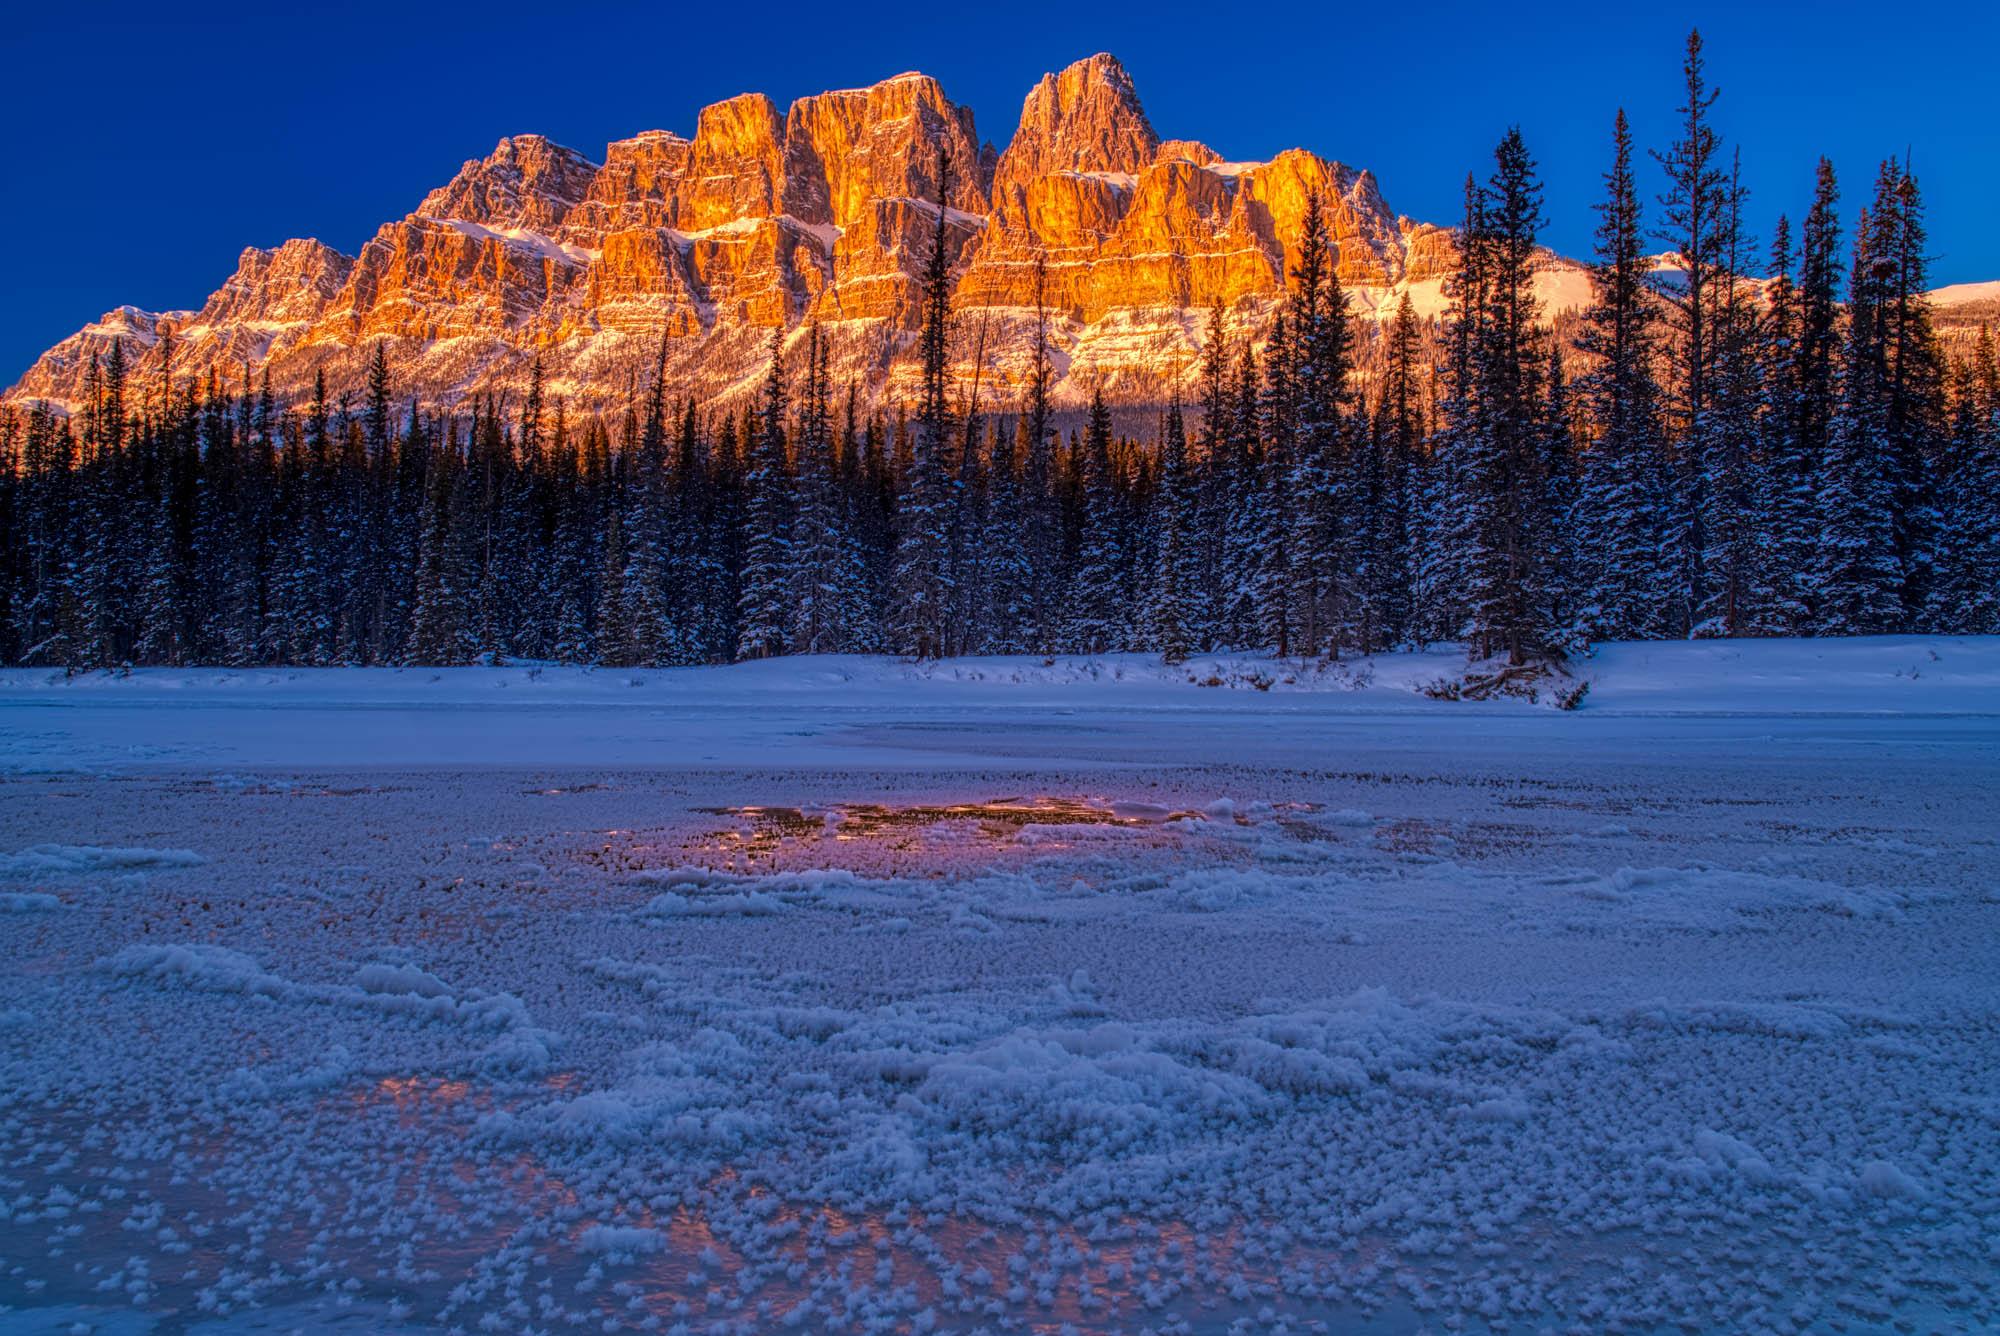 Castle Alpen Glow in Banff National Park, Canada